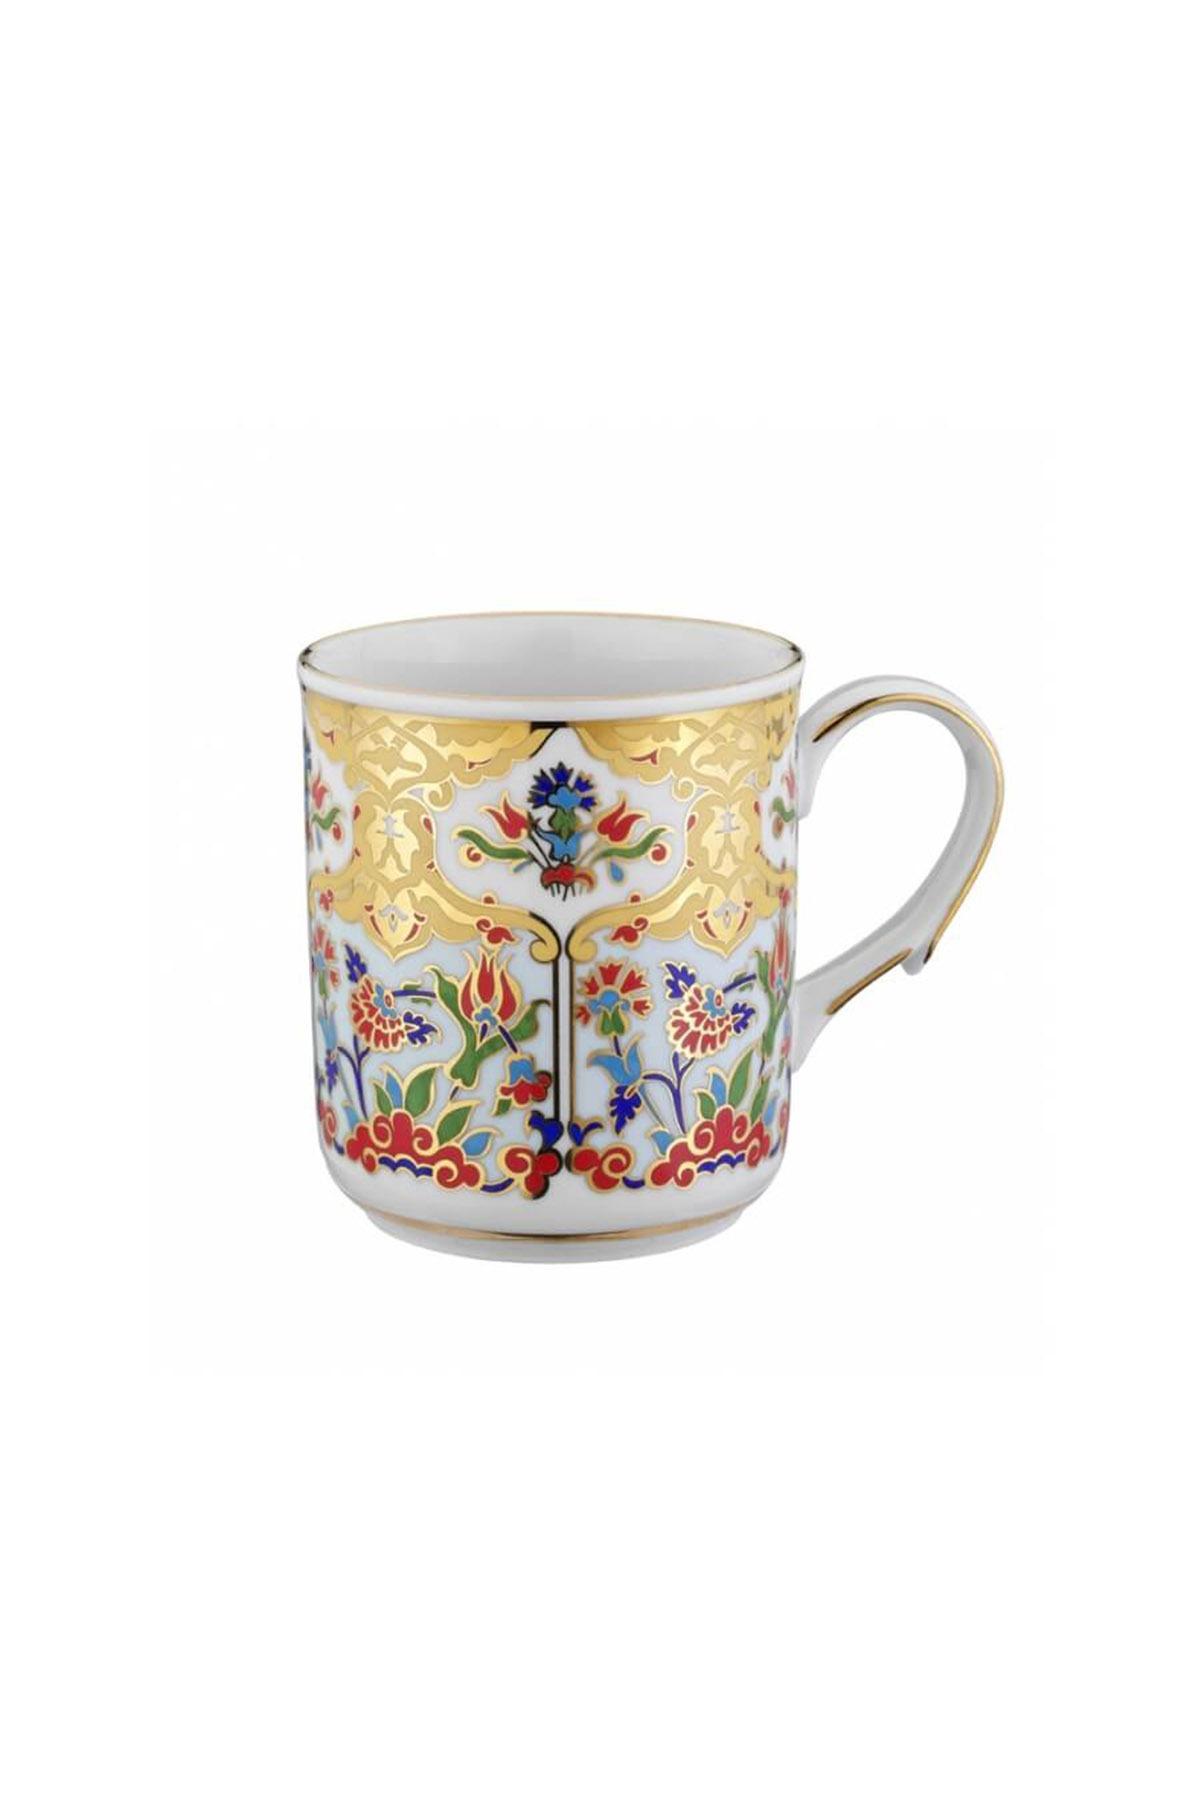 Kütahya Porselen - Kupa Bardak Dekor No:412